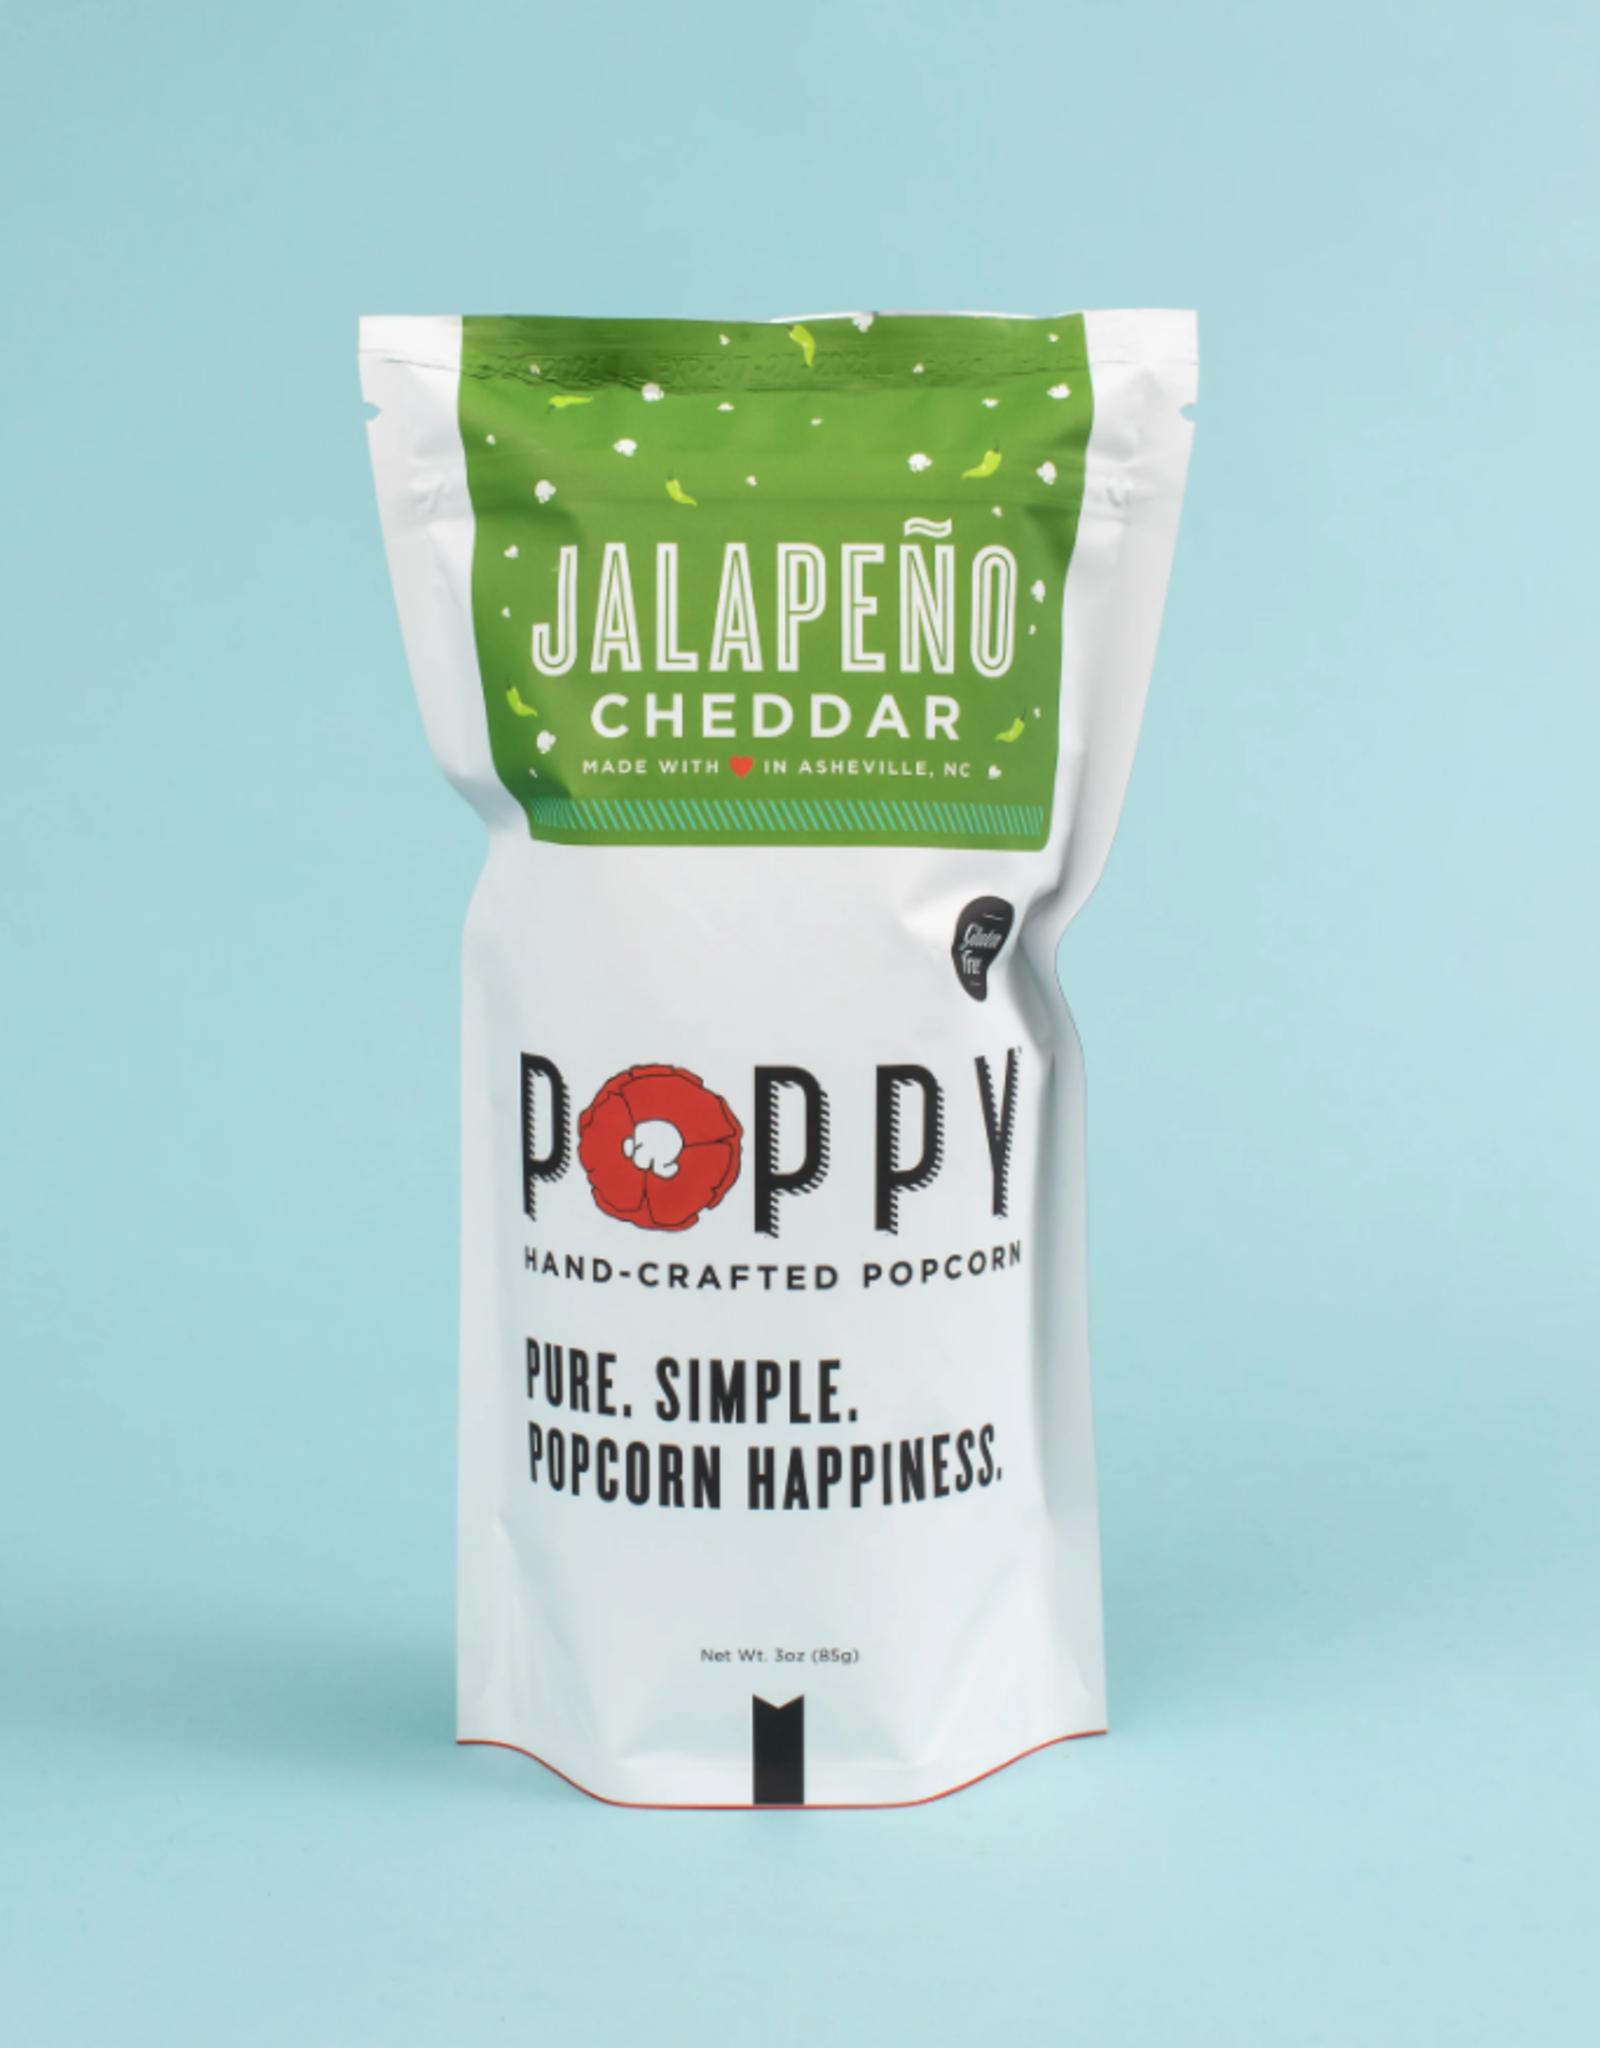 Poppy Handcrafted Popcorn - Jalapeno Cheddar